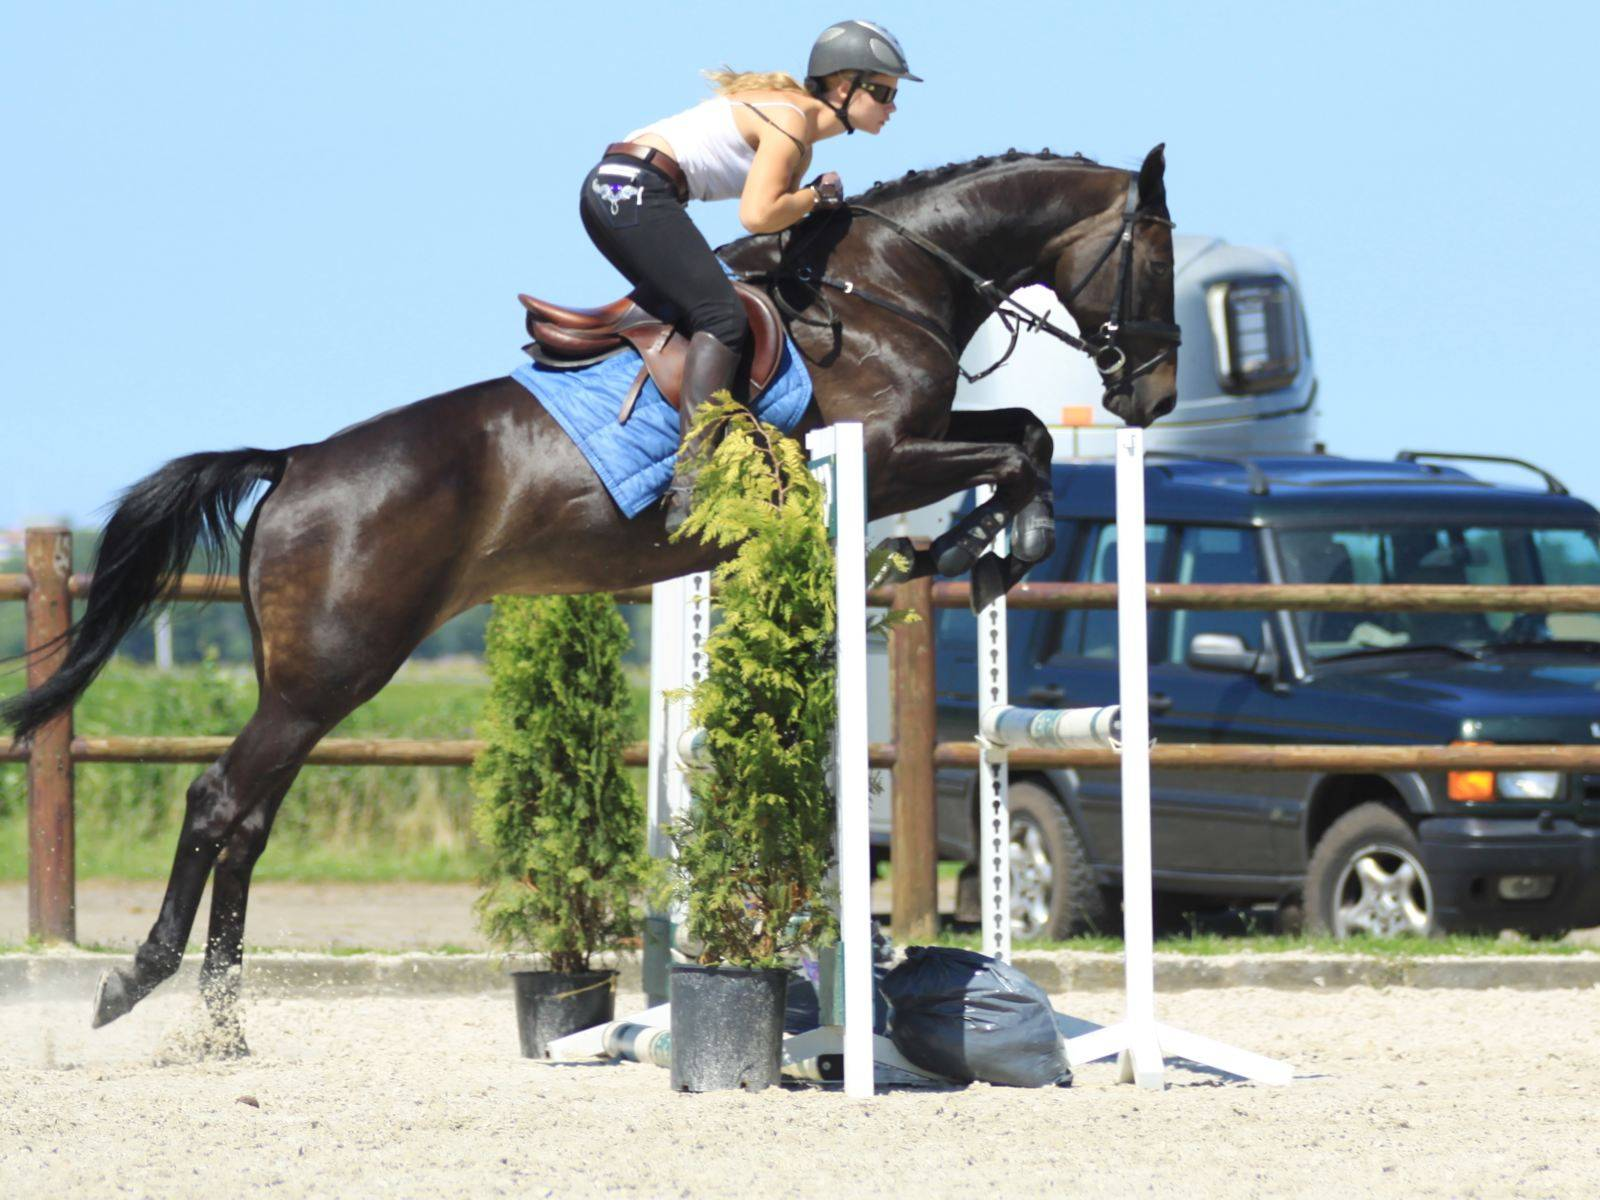 Jumping Horse for Sale Jeddah Riyadh